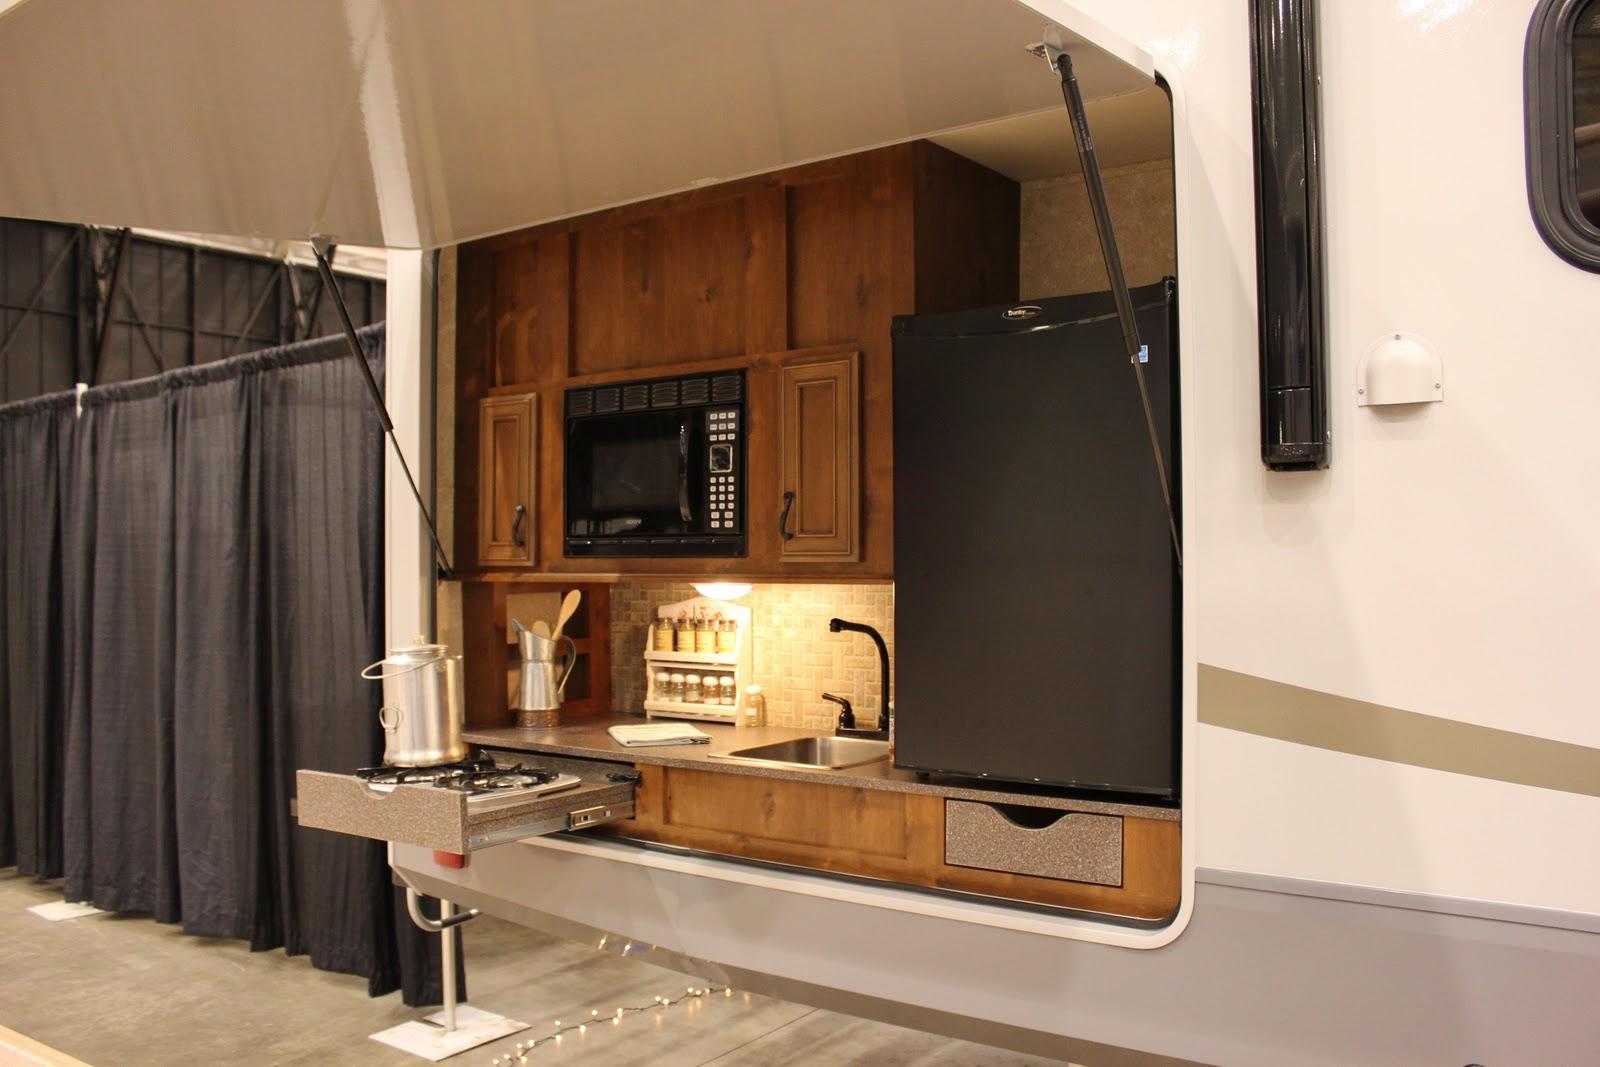 rv kitchen cabinets rv kitchen cabinets Kitchen Cabinet Accessories